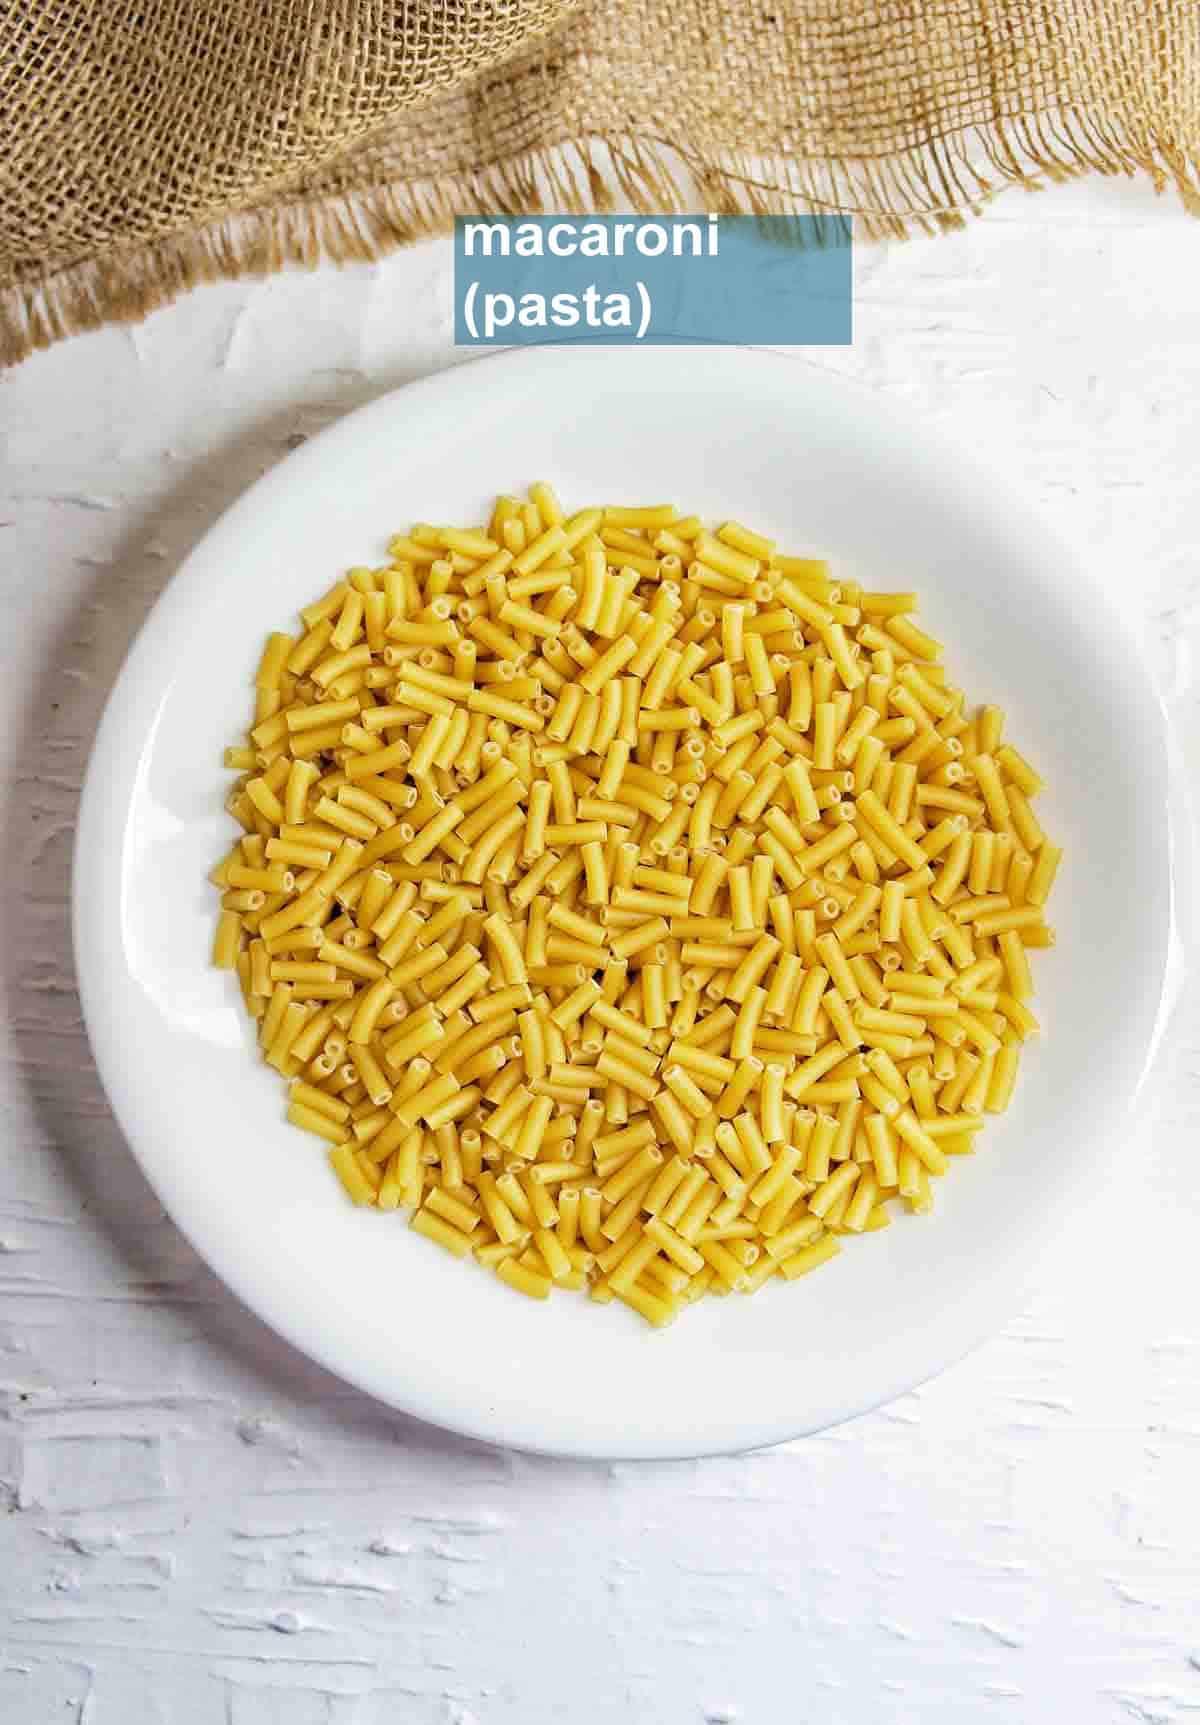 White bowl of dry uncooked macaroni pasta